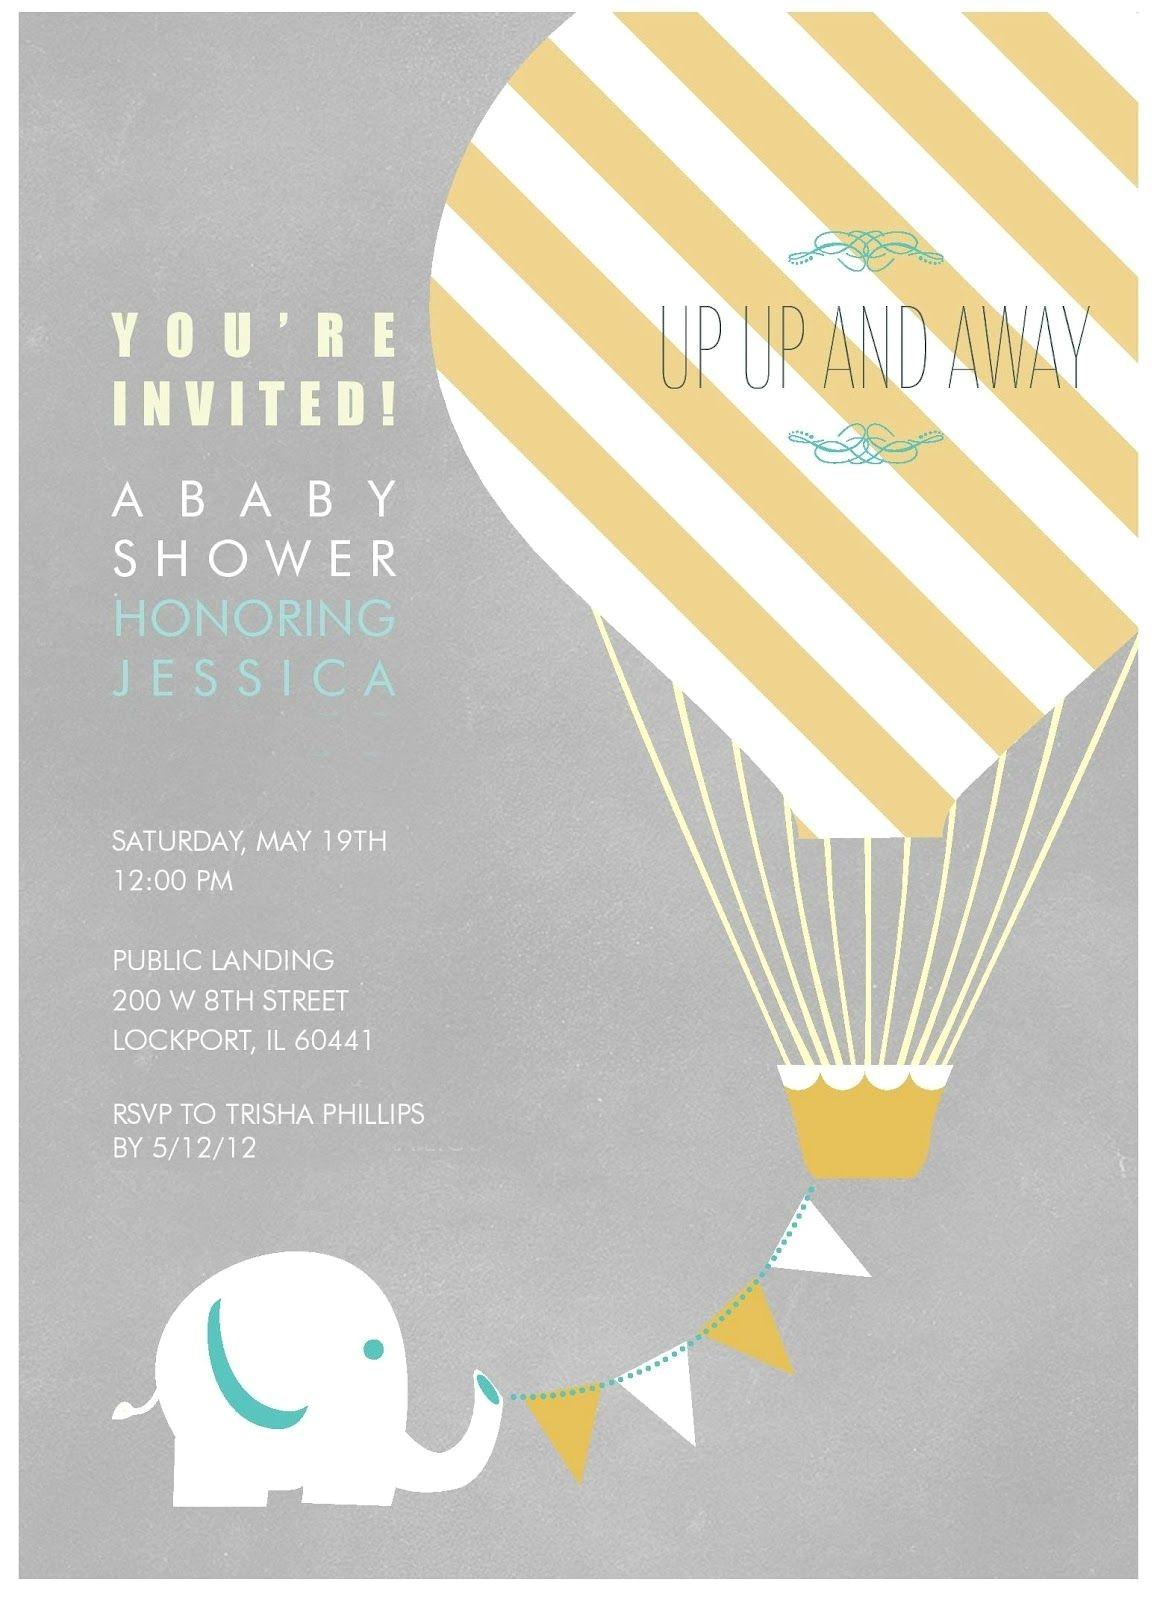 Hot Air Balloon themed Baby Shower Invitations Elephant with Hot Air Balloon Birthday Party Invitation